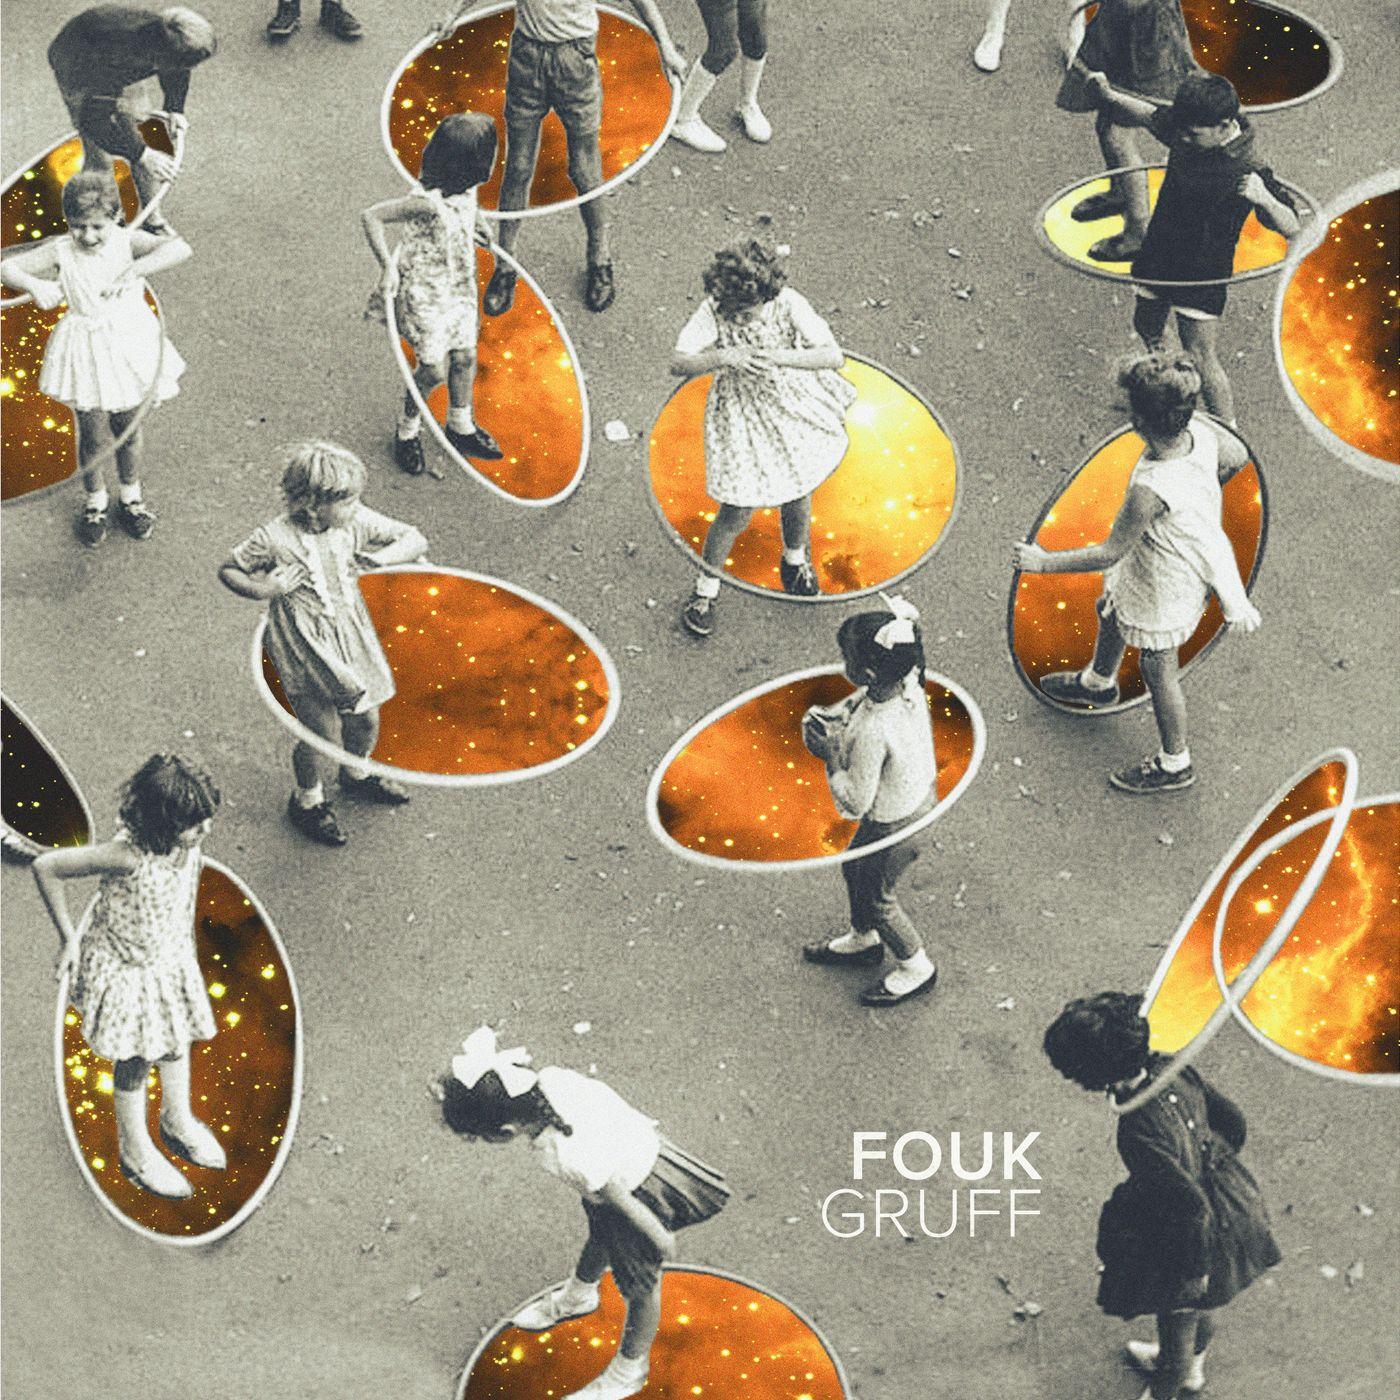 fouk_gruff_cover_1400_x_1400.jpg